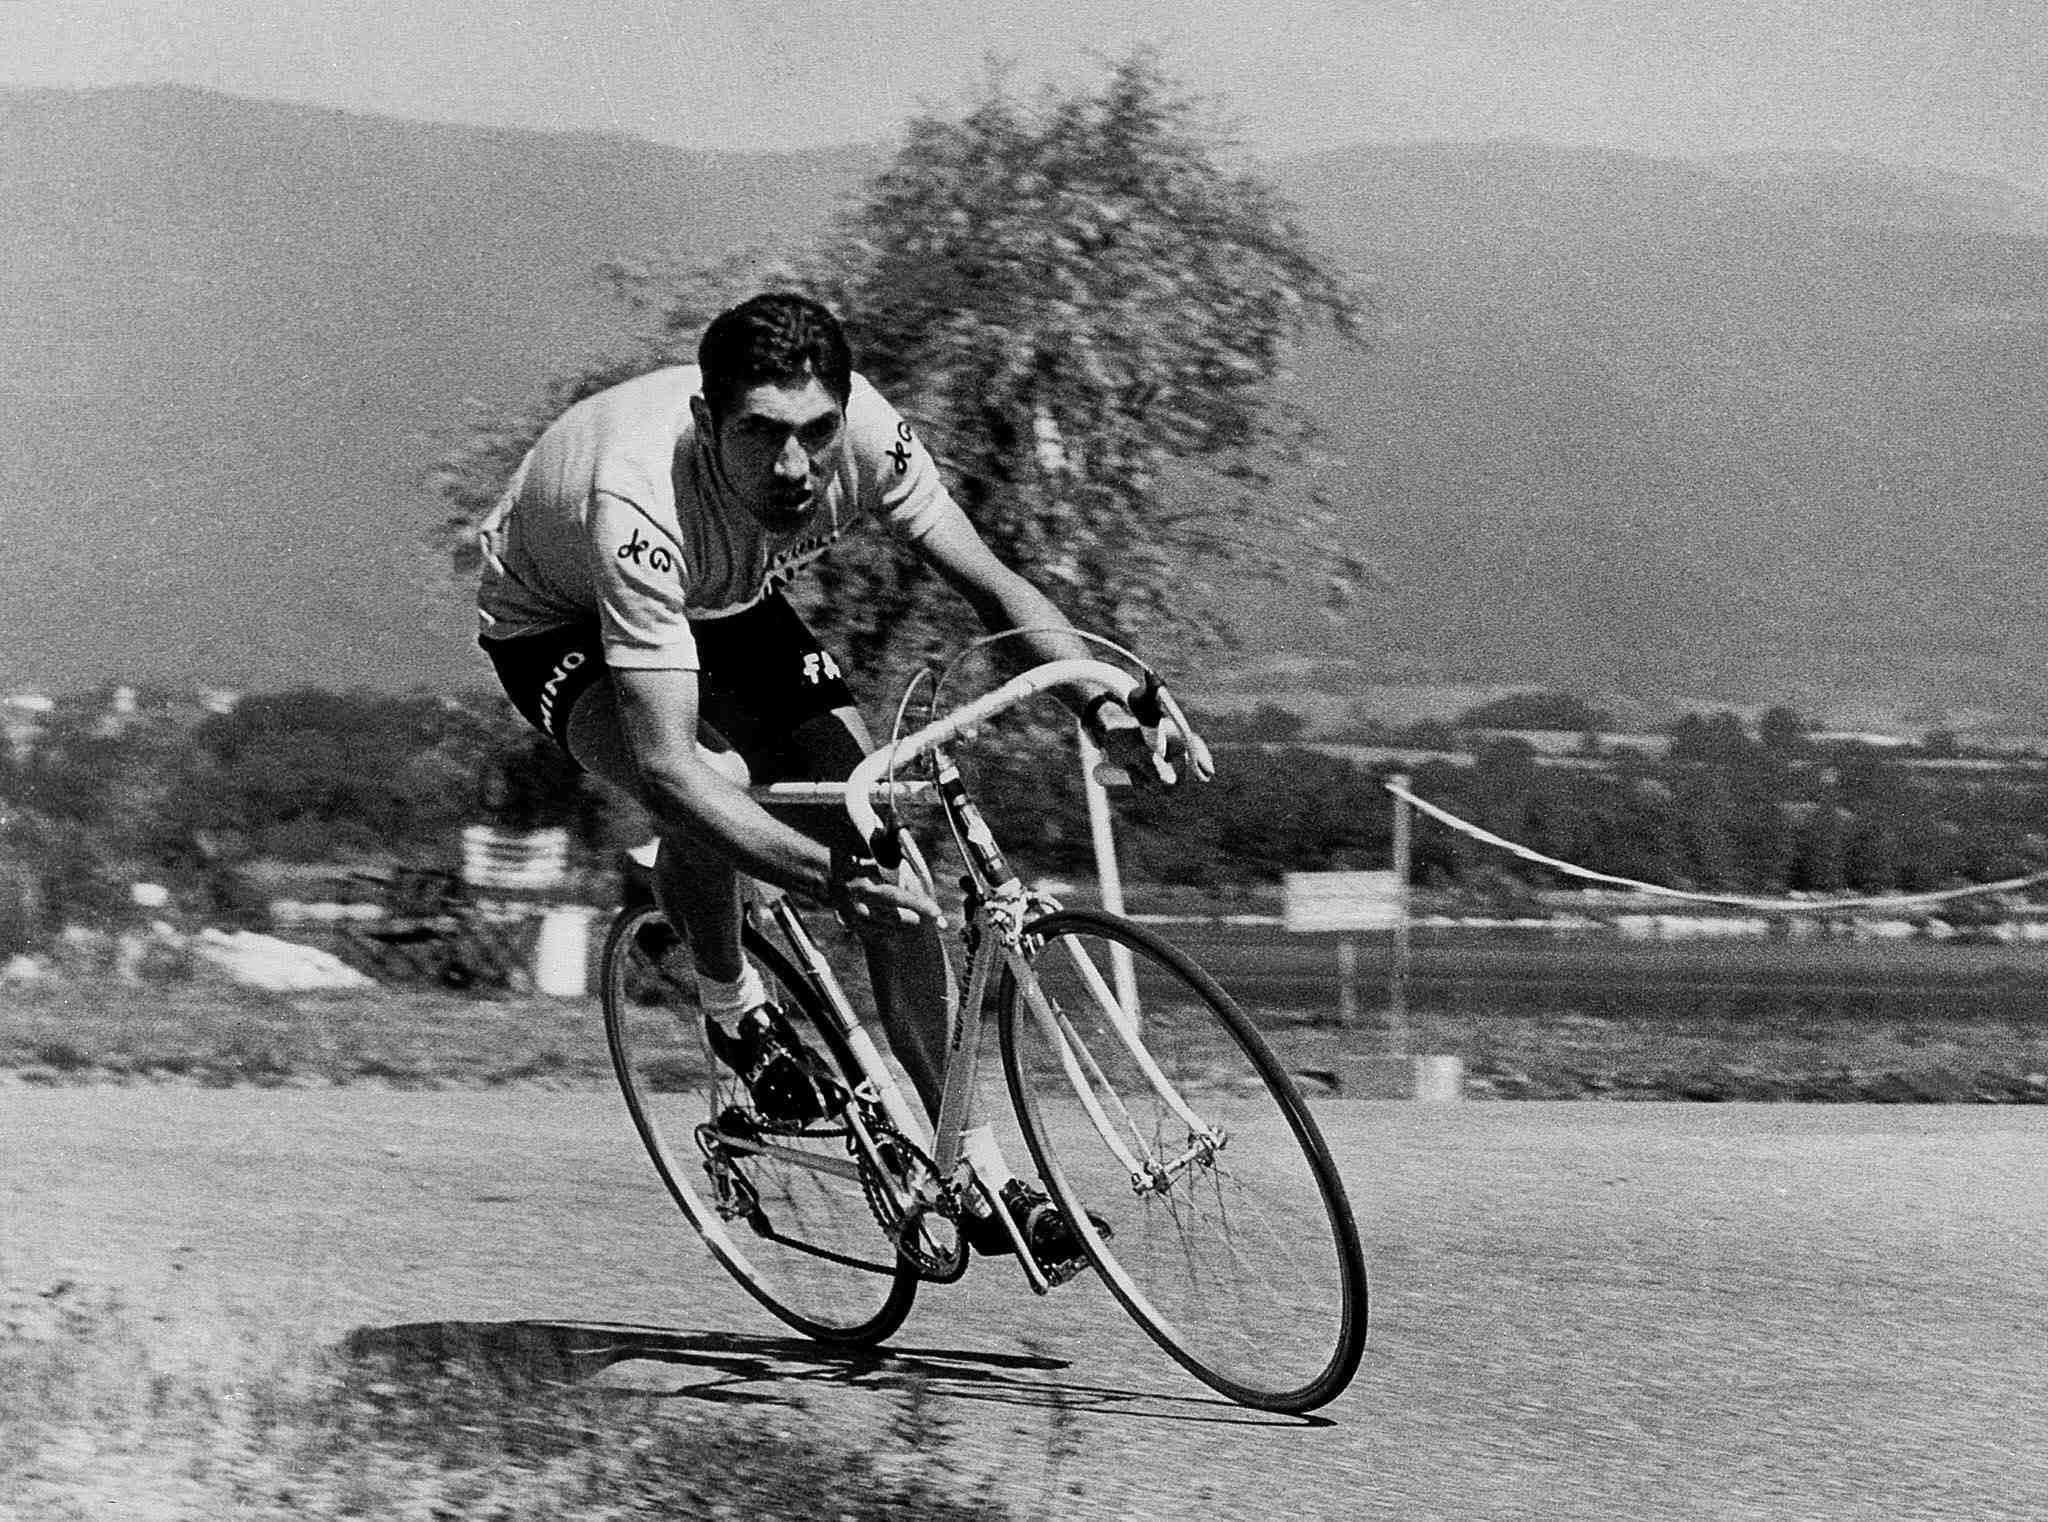 Eddy Merckx, king of them all (1970 file photo).